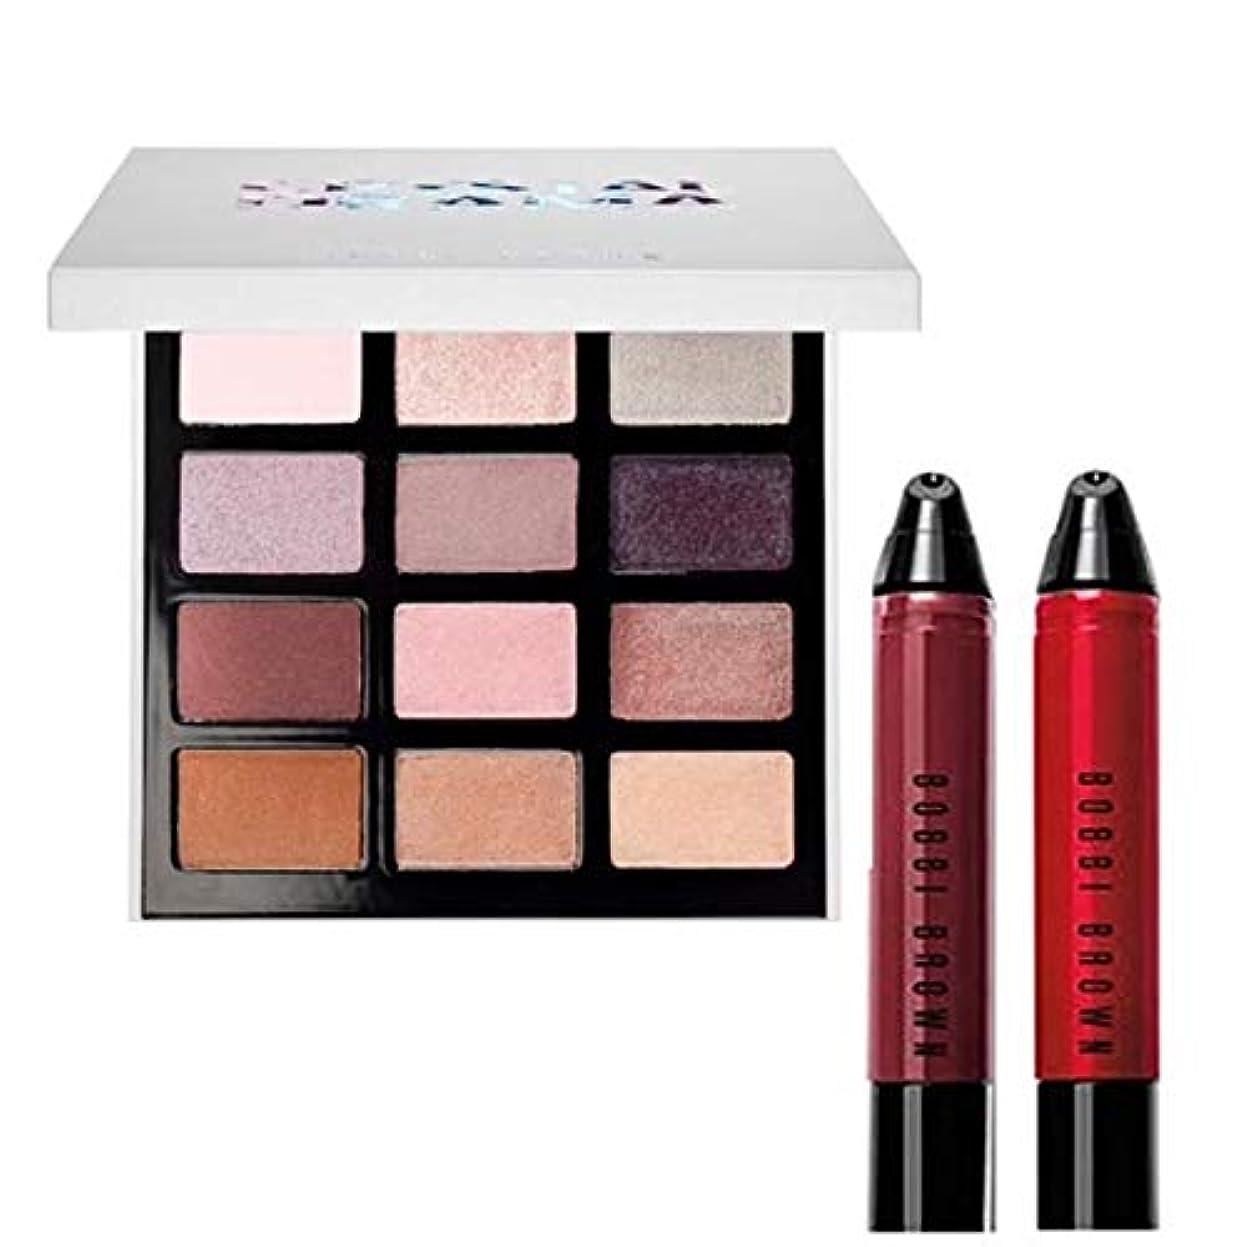 刻む植生配偶者Bobbi Brown 限定版,Crystal Drama Eyeshadow Palette & Lip Art Mini Art Stick Liquid Lip 2Set [海外直送品] [並行輸入品]